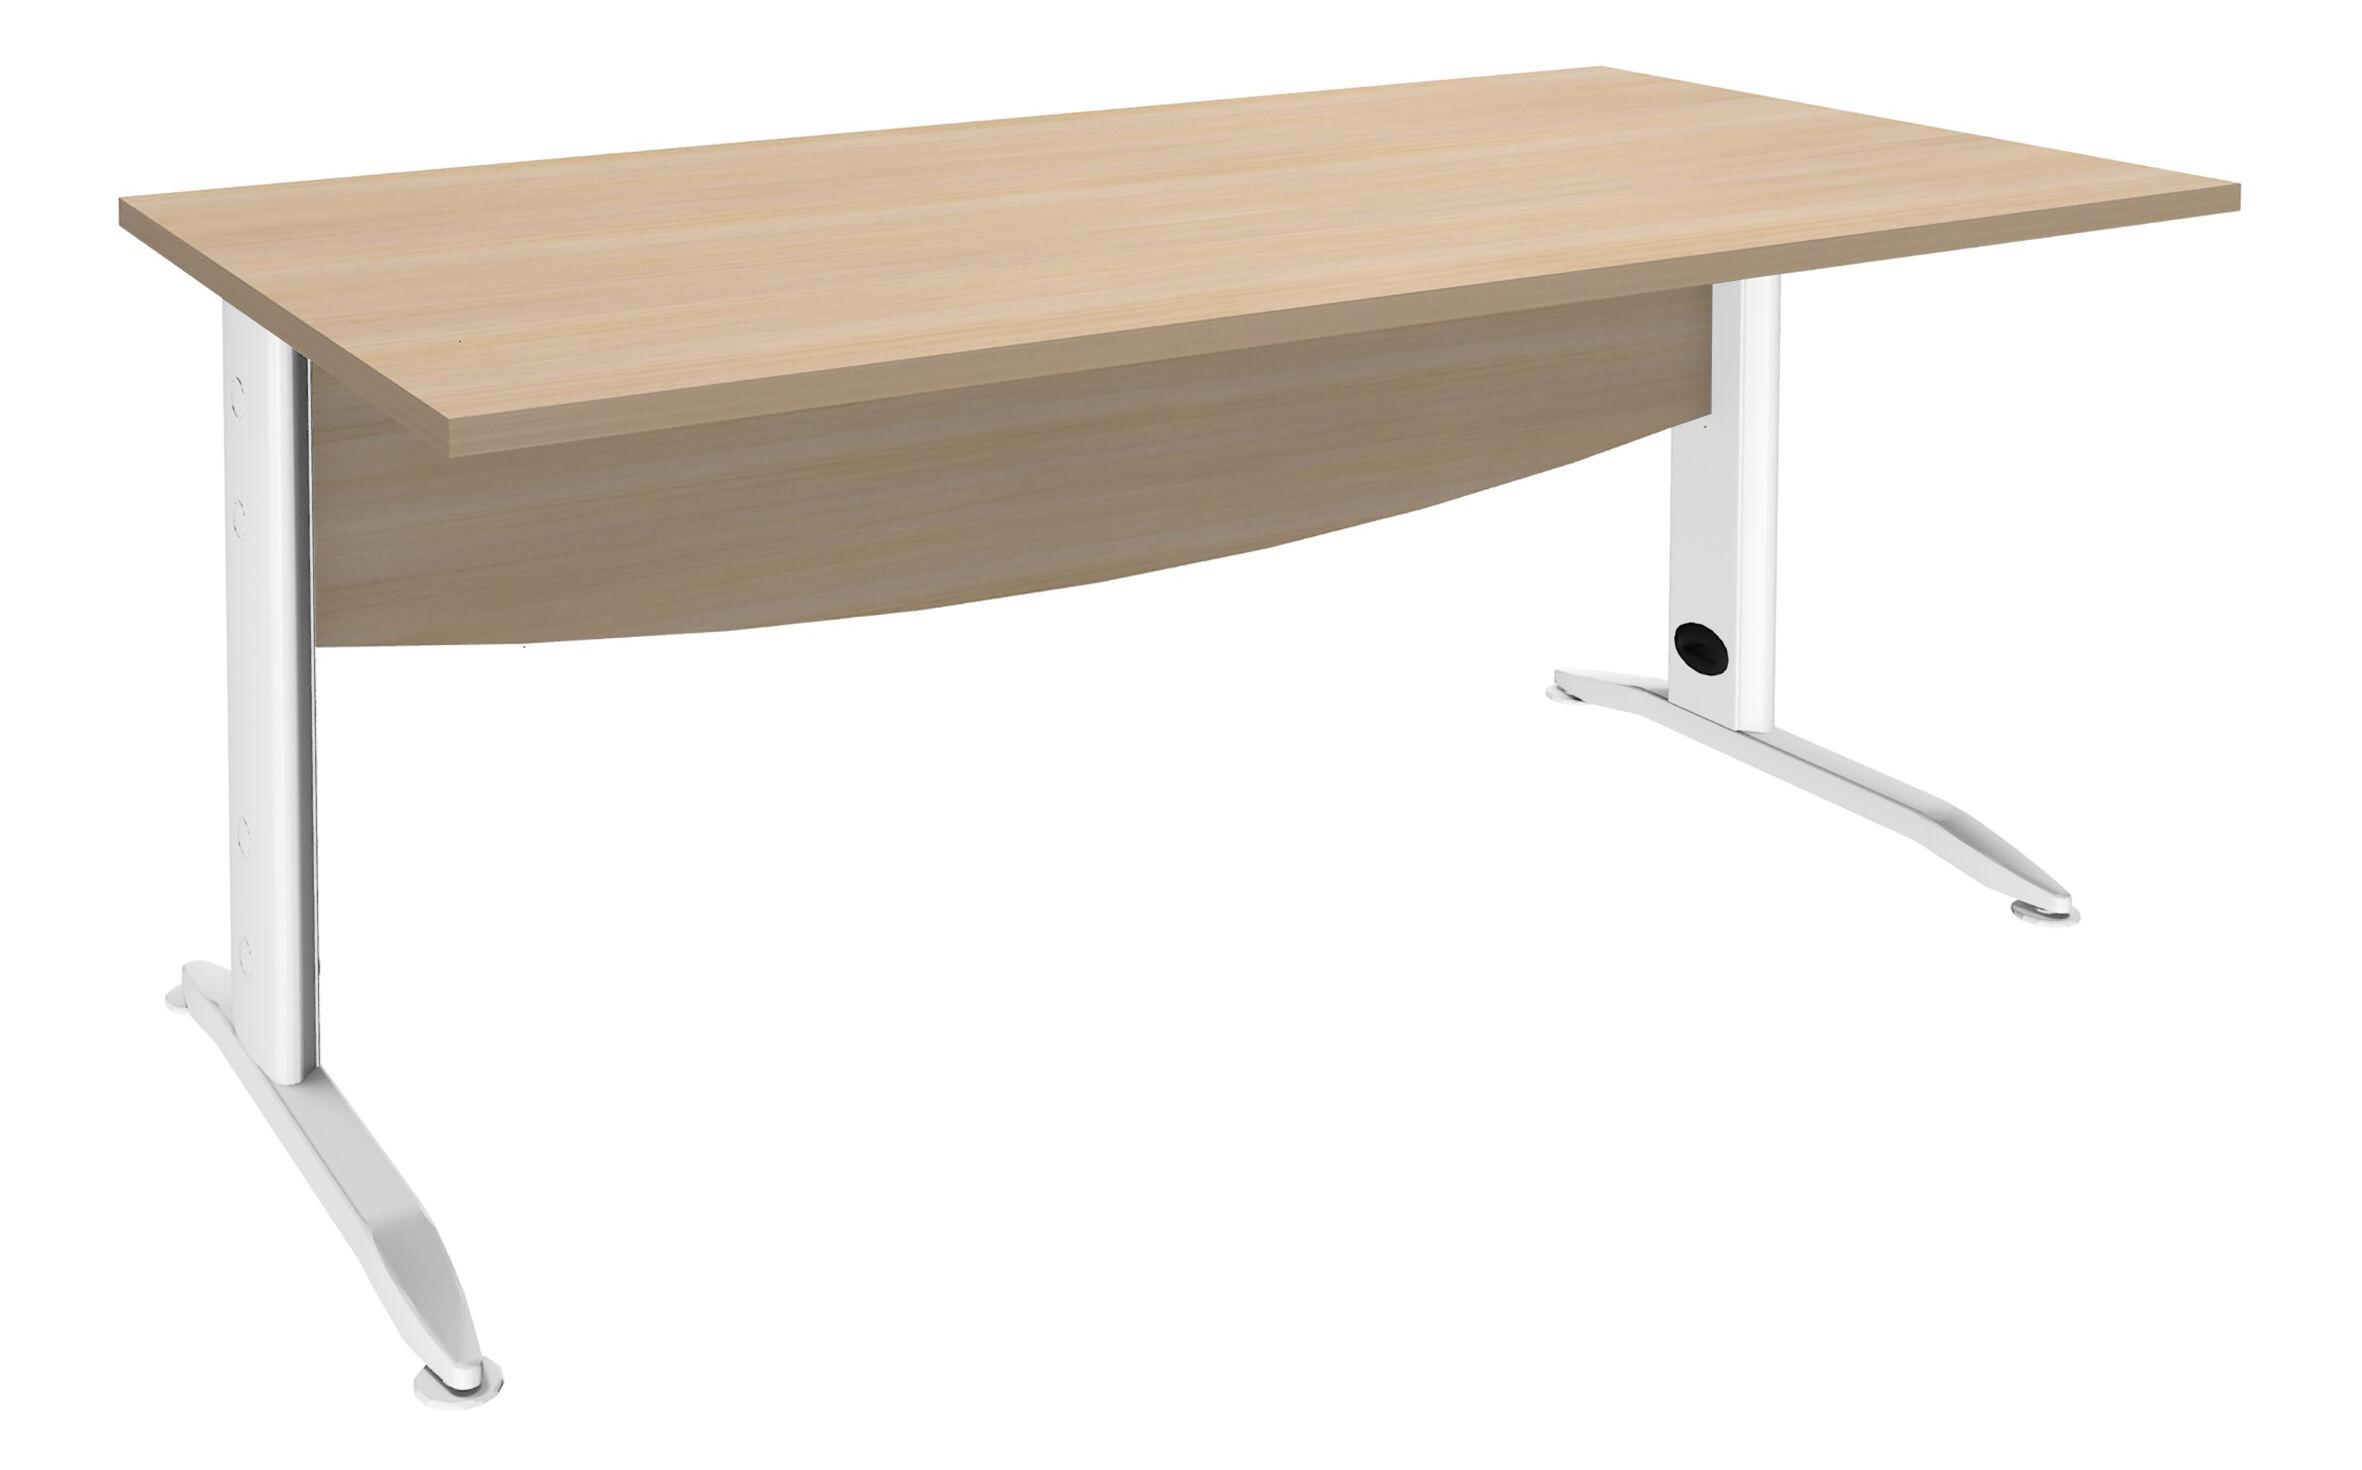 Bureau droit IDRA - L140 cm - Pieds blanc - plateau imitation Chêne clair